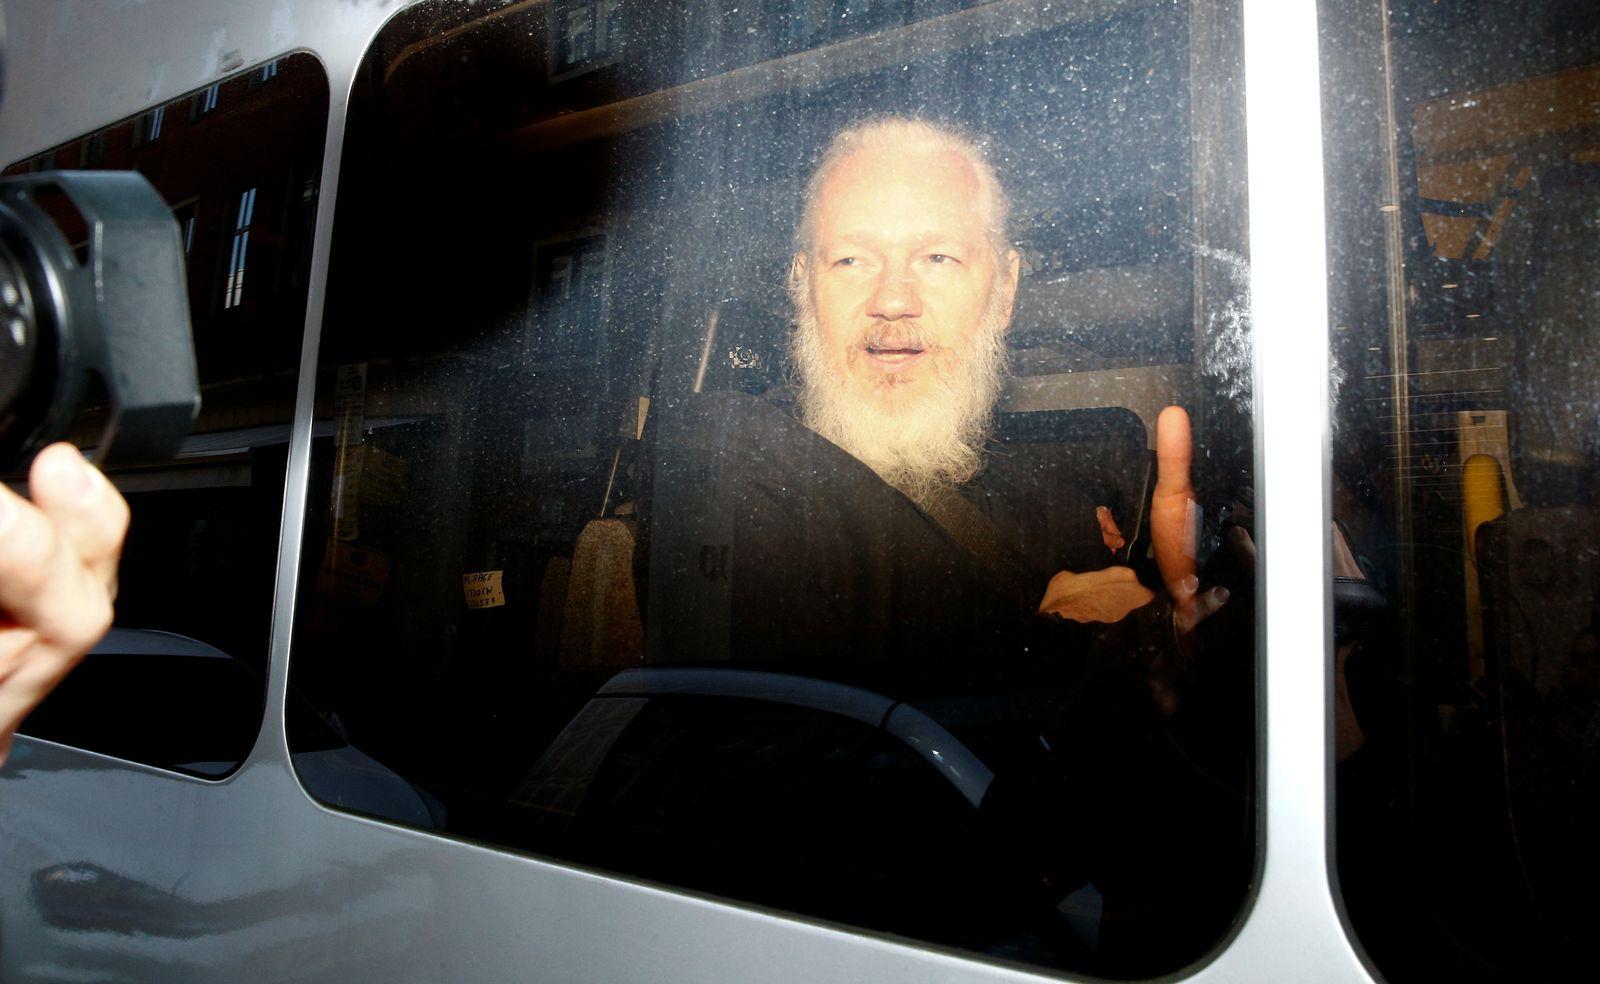 Assange / Festnahme